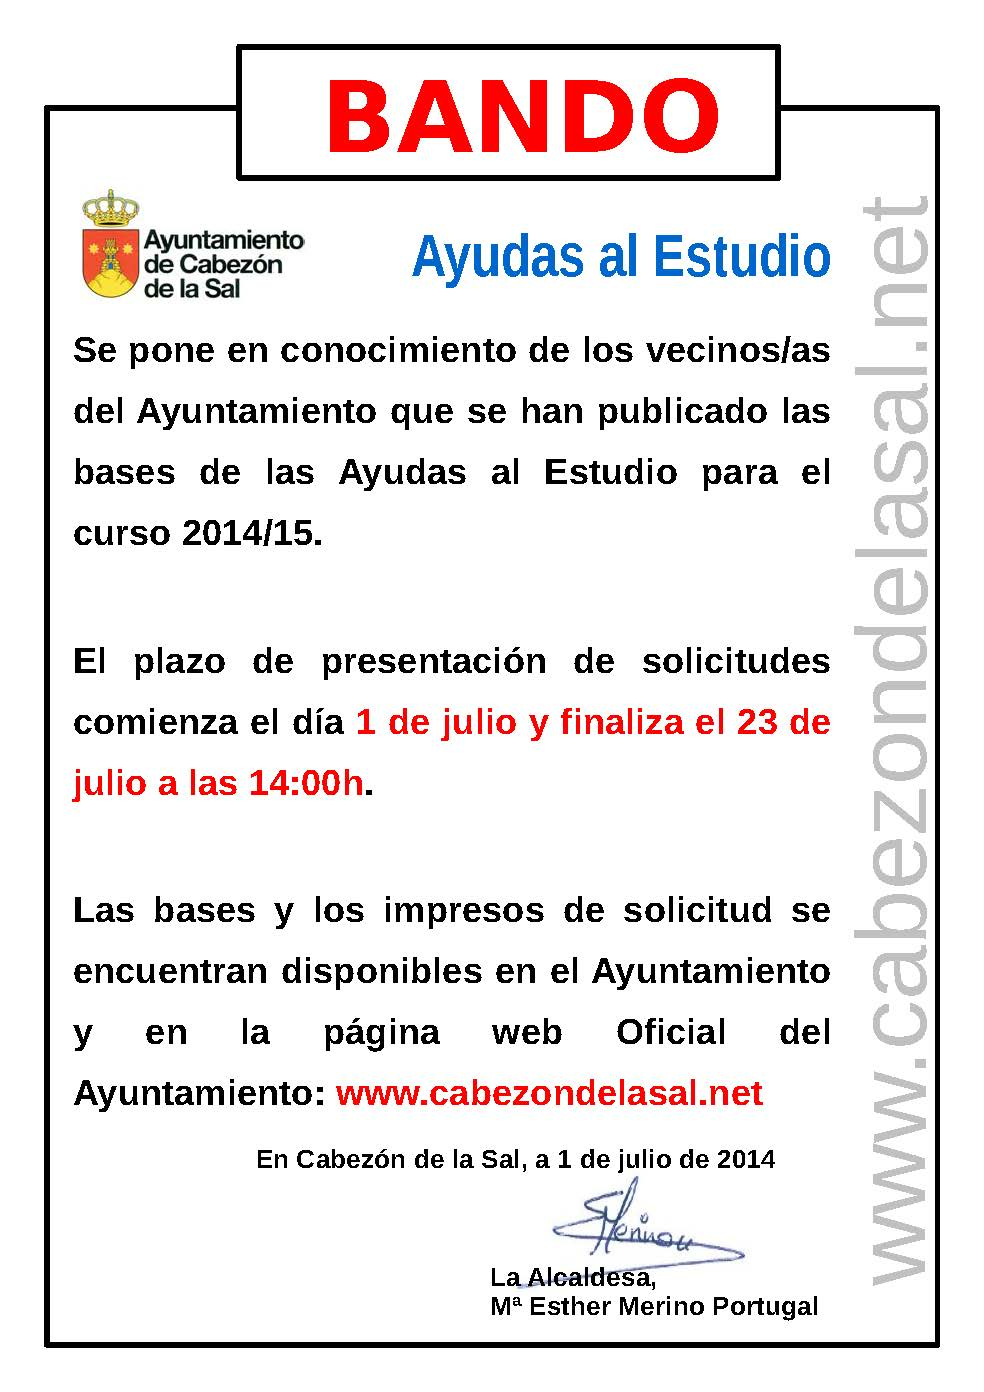 http://www.cabezondelasal.net/wp-content/uploads/2014/07/Bando-Ayudas-libros-2014.jpg